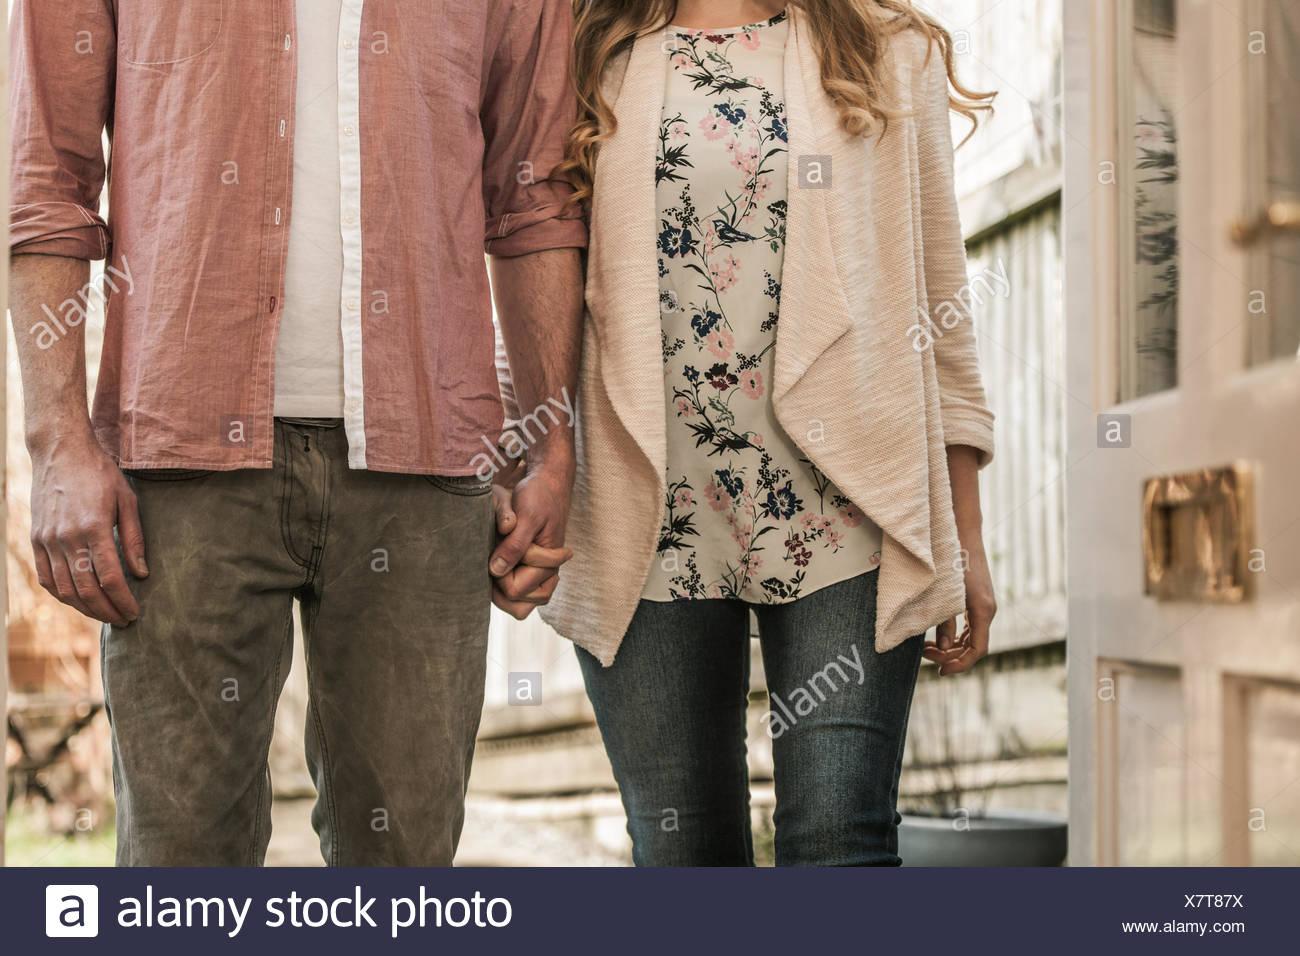 Couple standing outside an open door - Stock Image